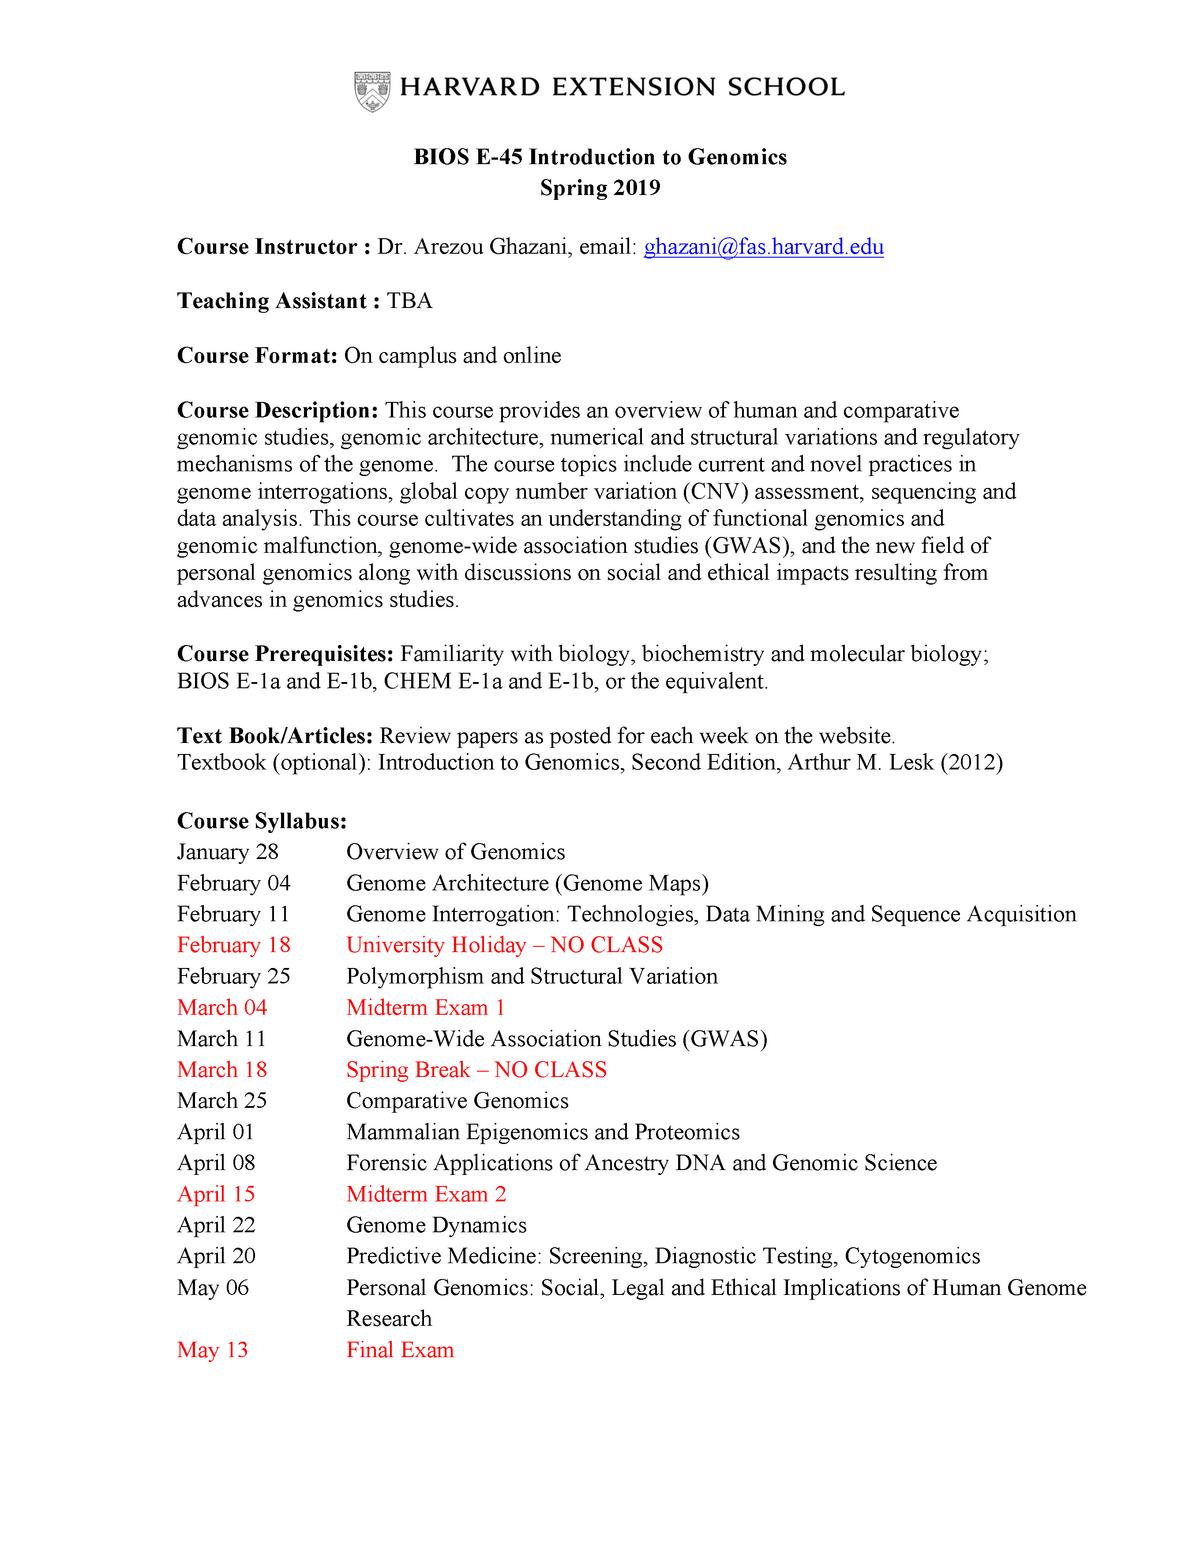 BIOS E45-Syllabus and Course Information-revised - BIOS E-45